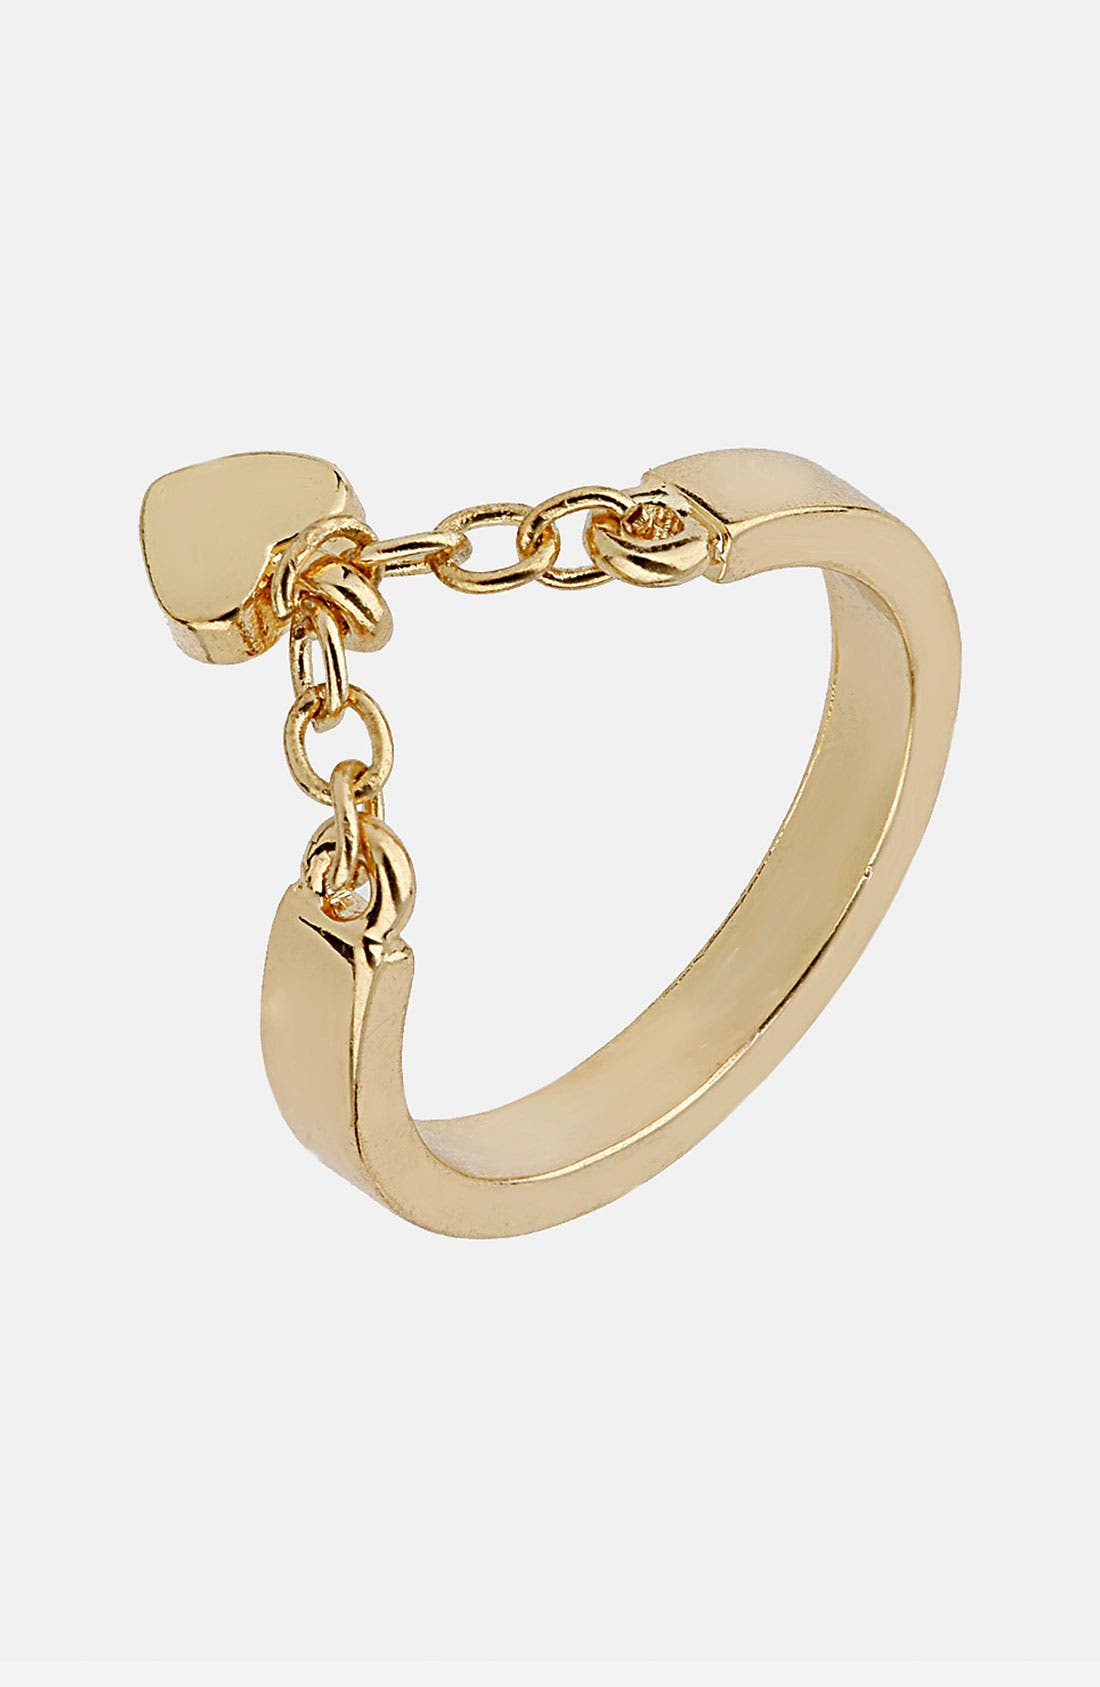 Main Image - Topshop 'Heart Chain' Ring